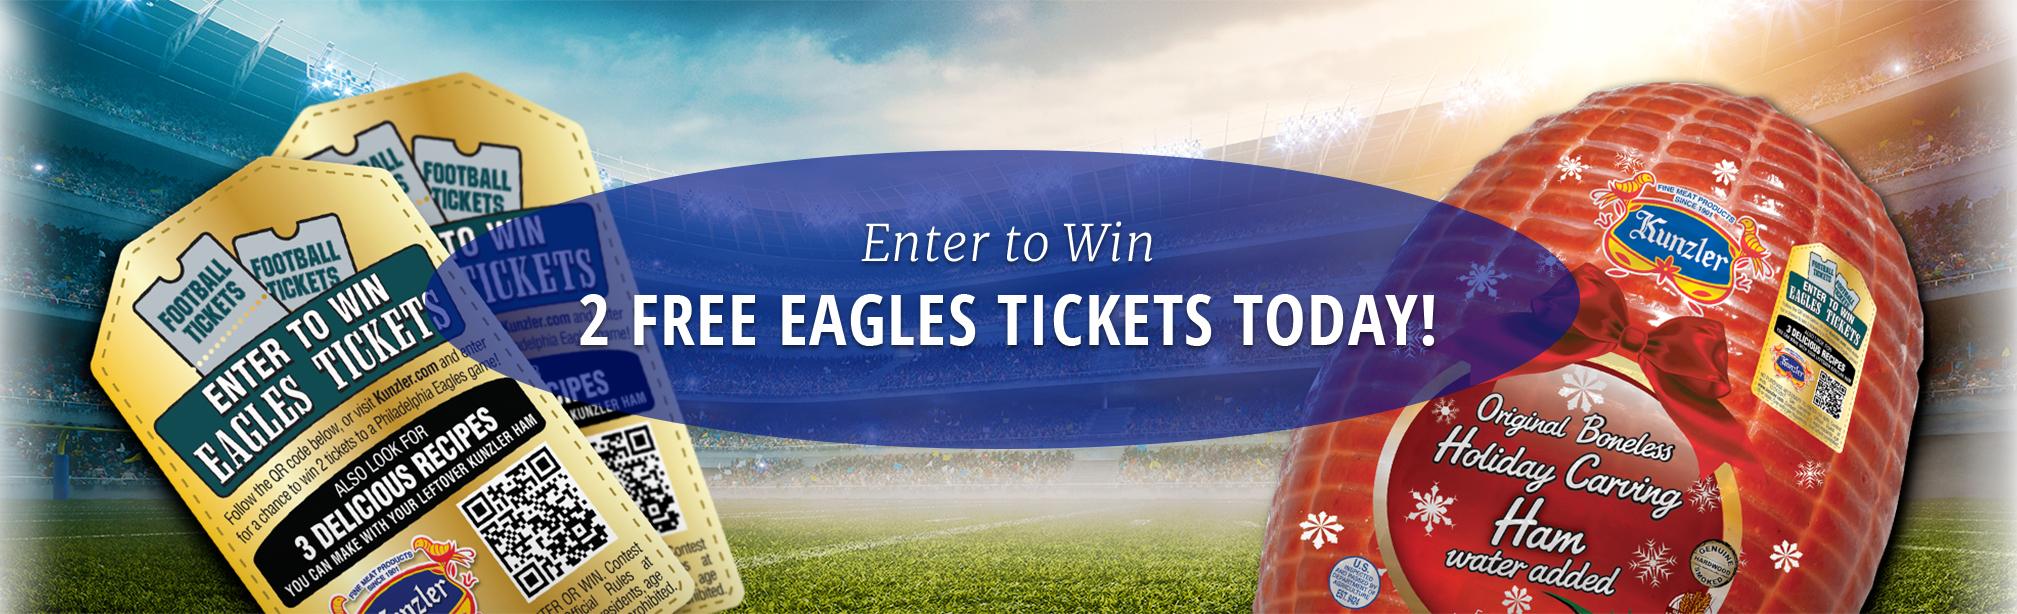 Kunzler ham and eagle tickets